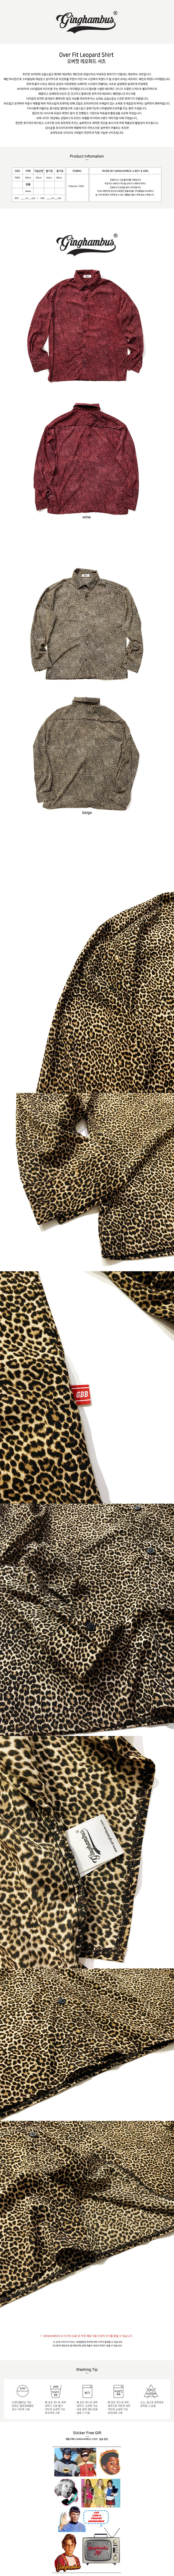 overfitleopardshirt9001.jpg